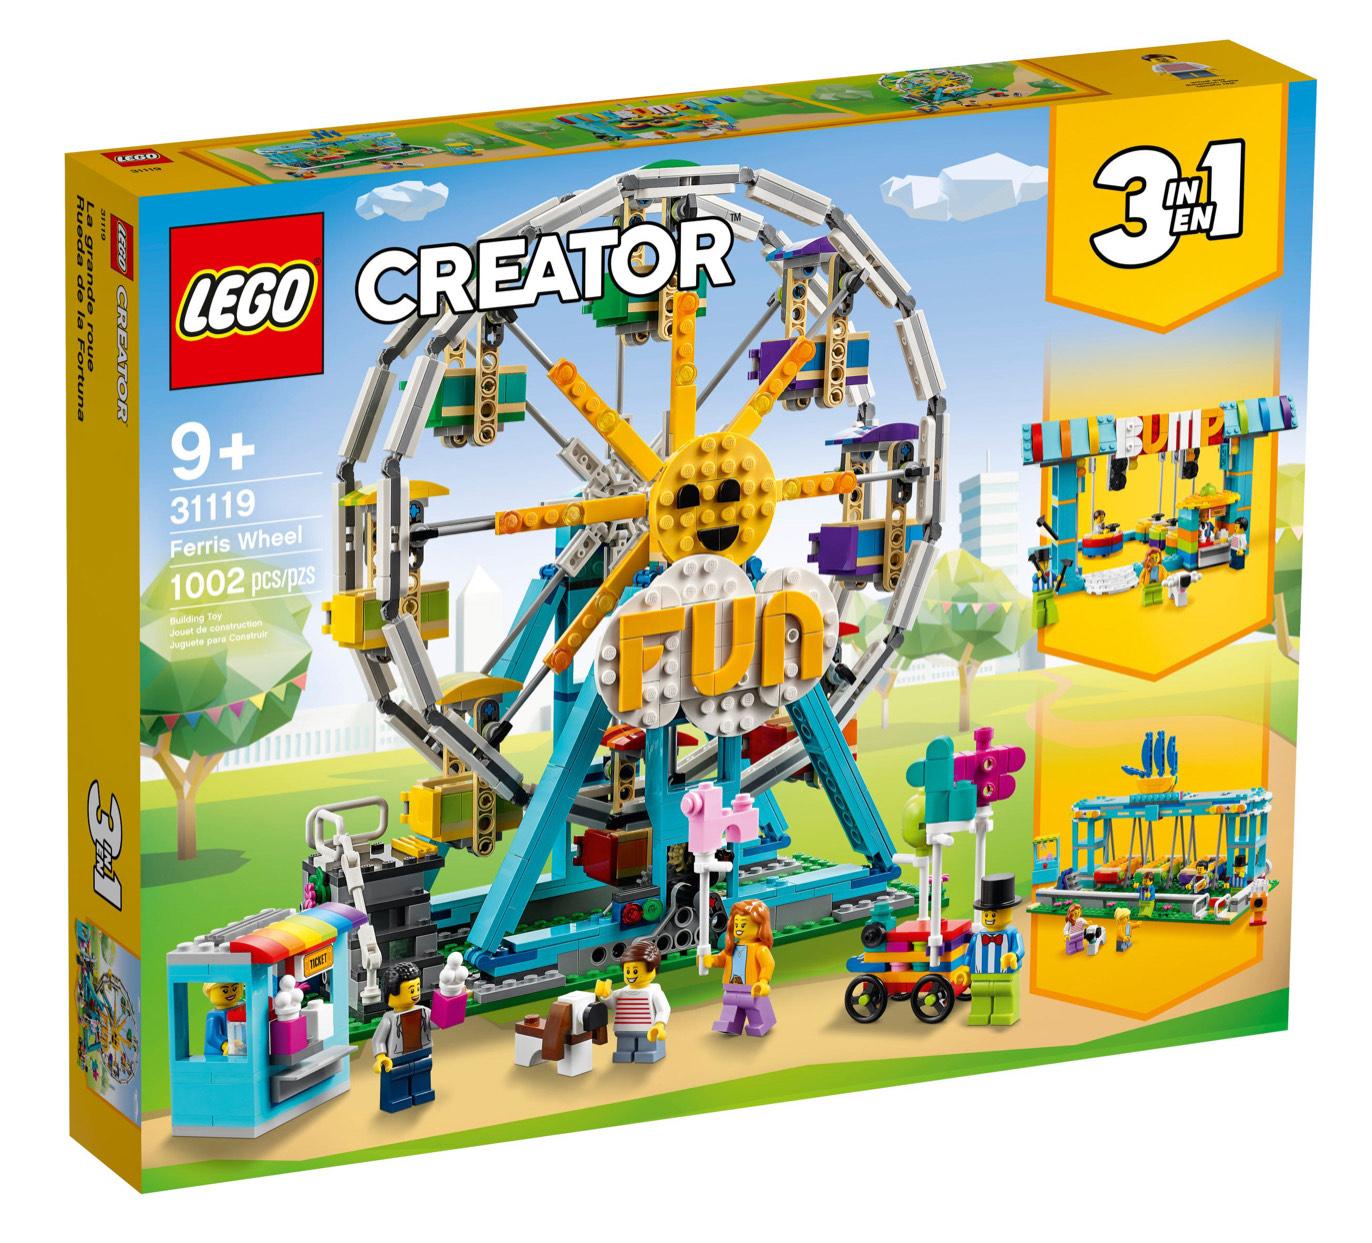 Lego Creator 3 in 1 Reuzenrad (31119)